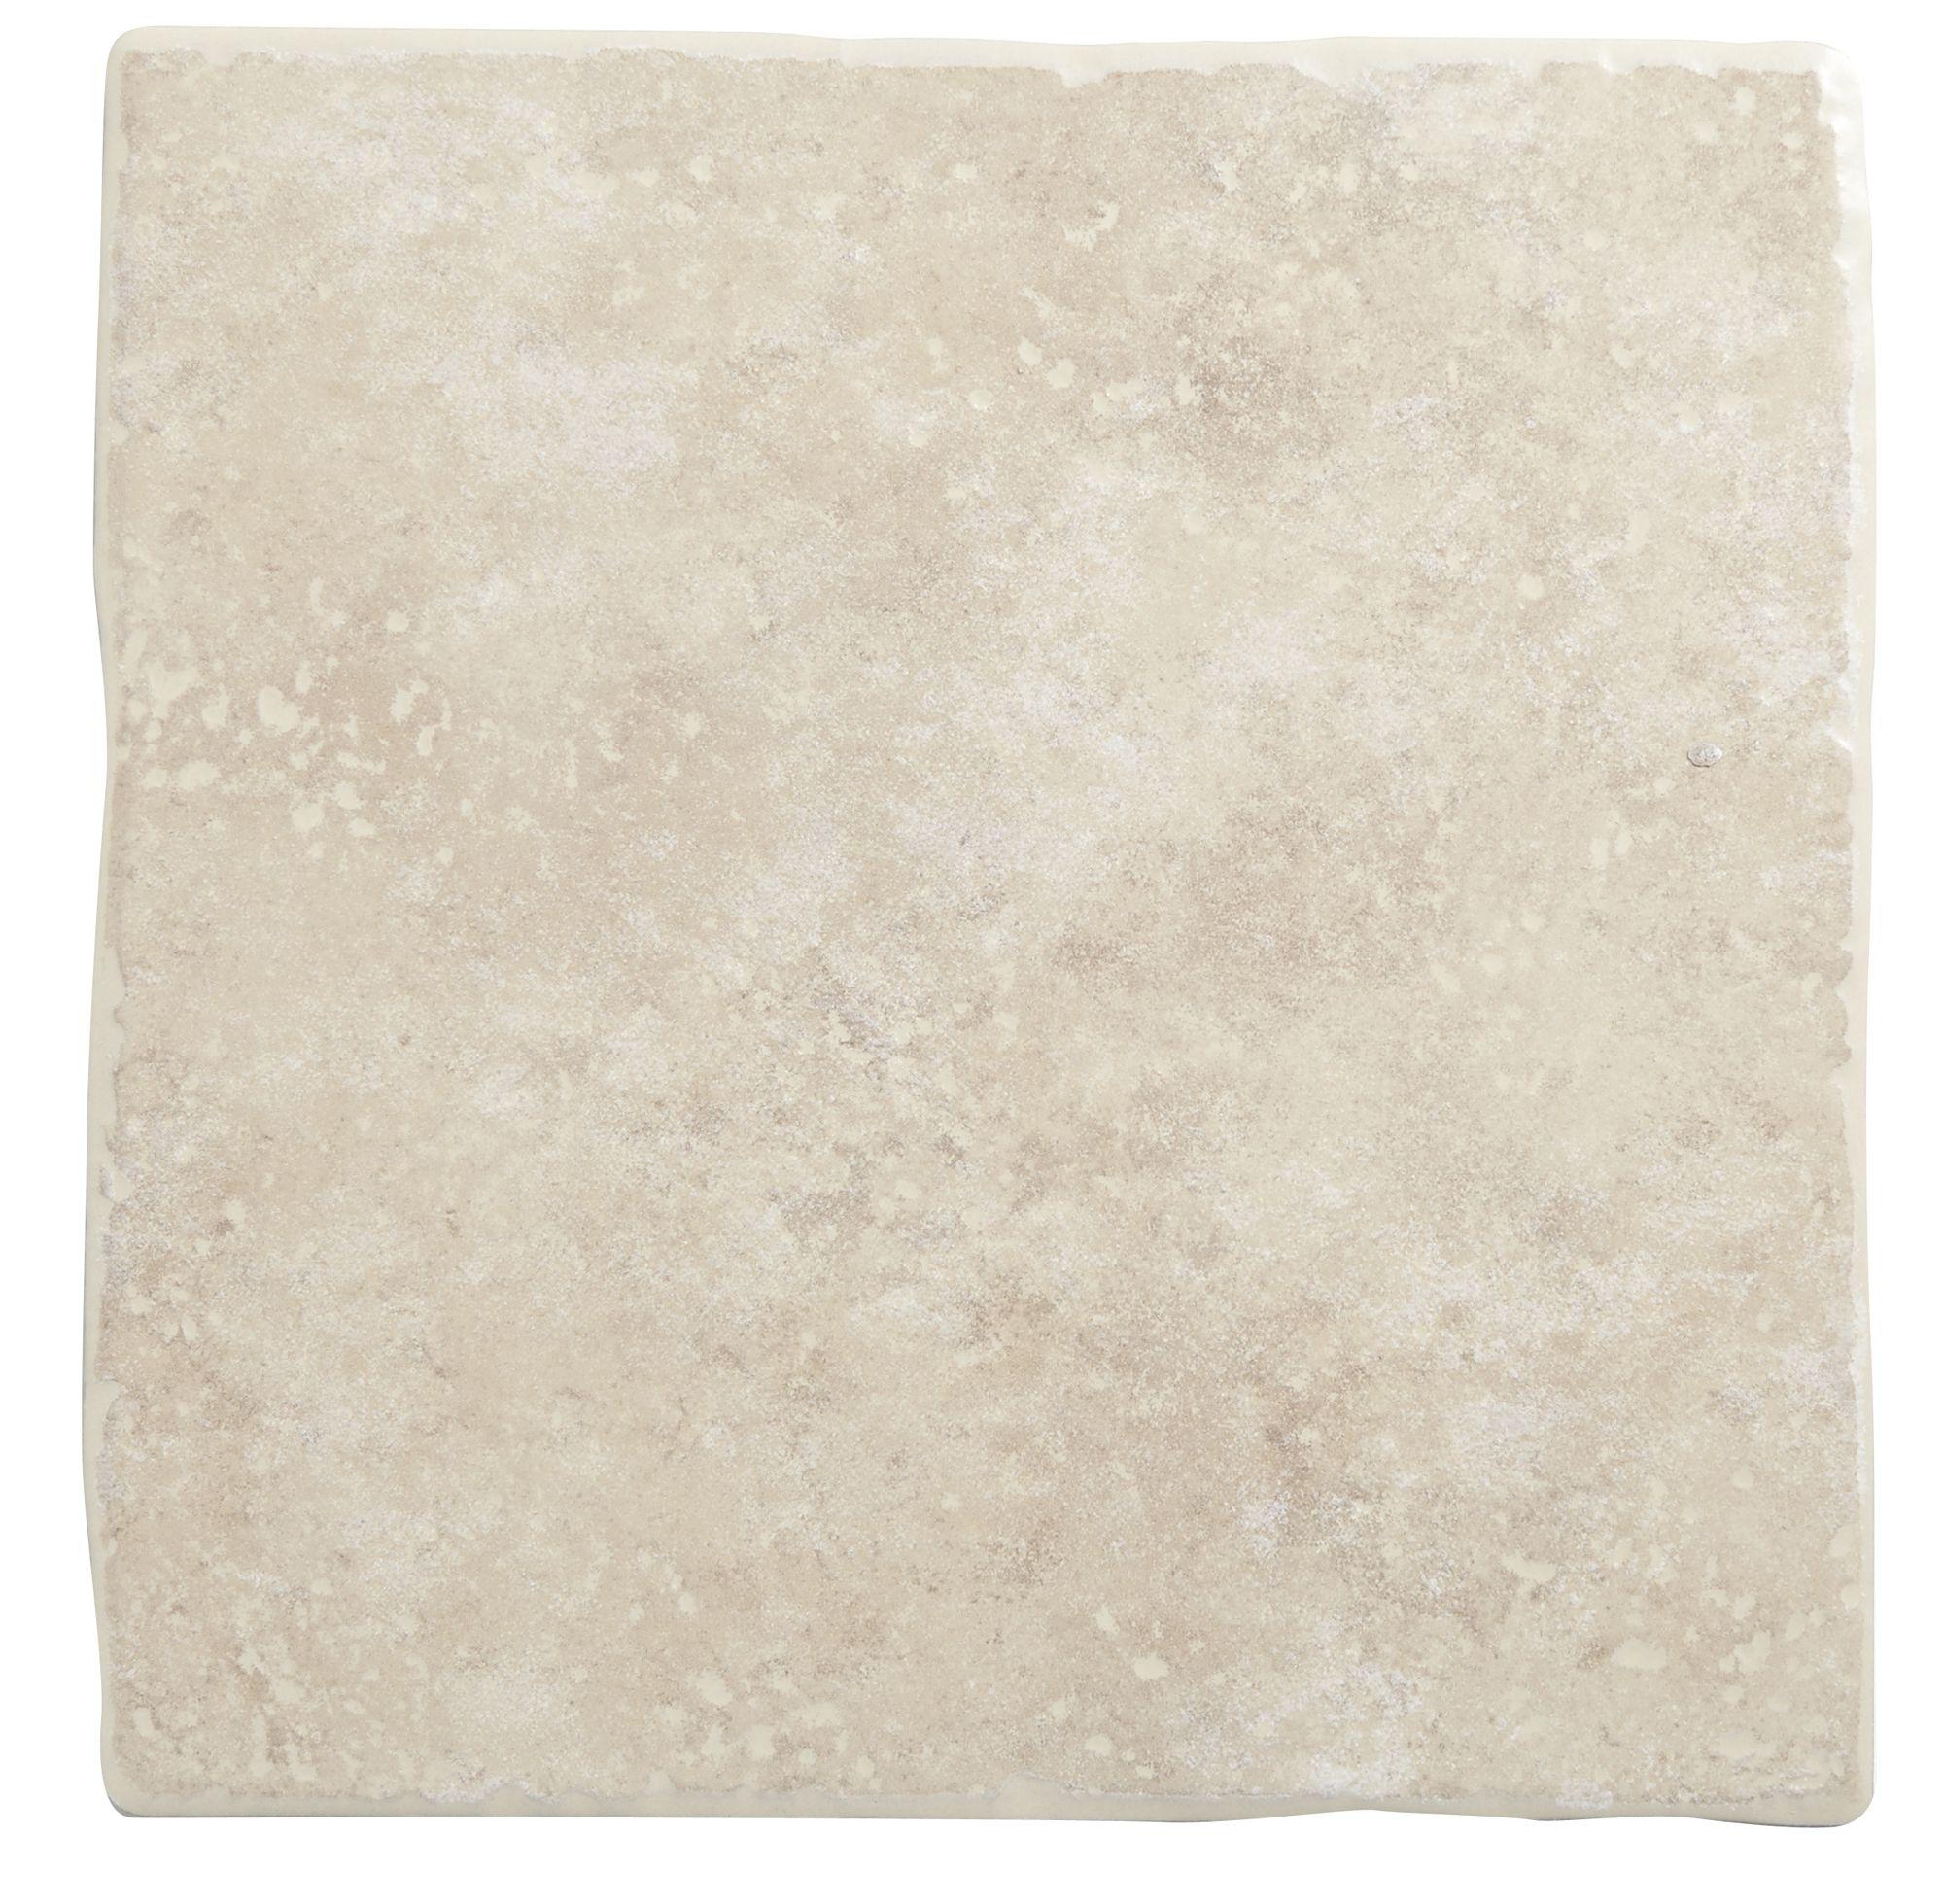 Calcuta natural stone effect ceramic sample floor tile l330mm calcuta natural stone effect ceramic sample floor tile l330mm w330mm departments diy at bq dailygadgetfo Gallery